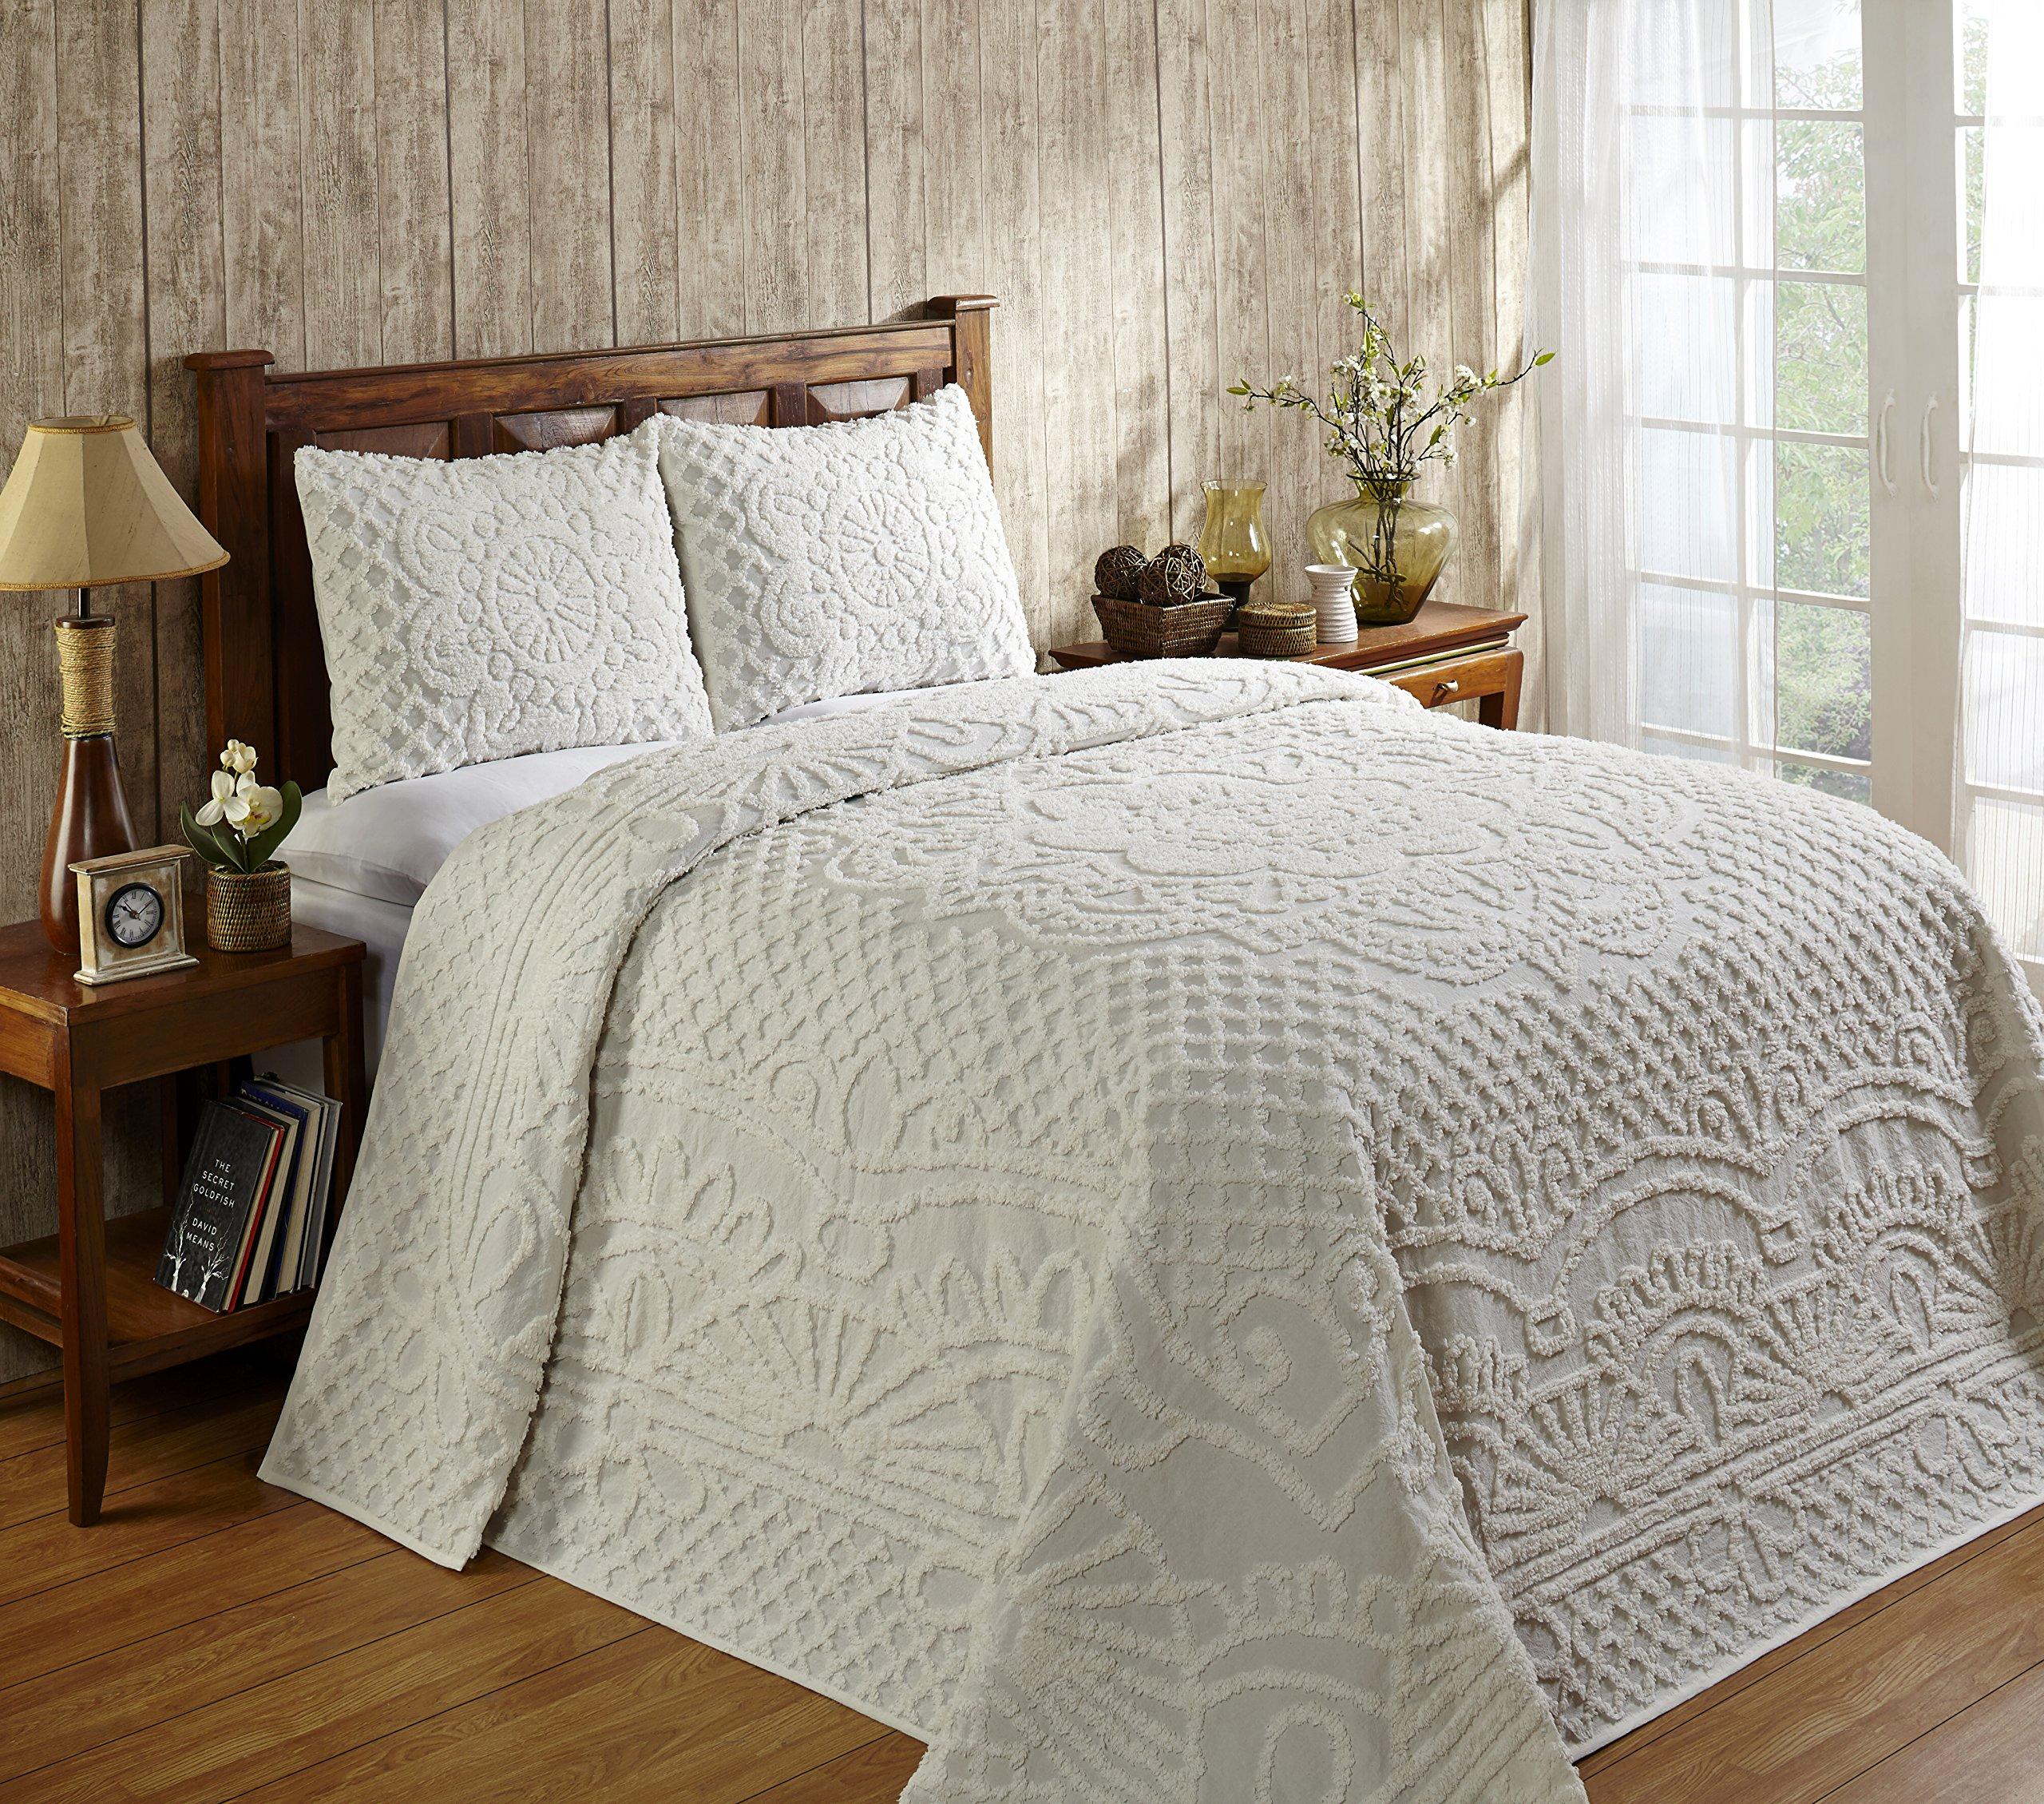 Better Trends / Pan Overseas 120 X 110 Inch Trevor Bedspread Set, King, Natural